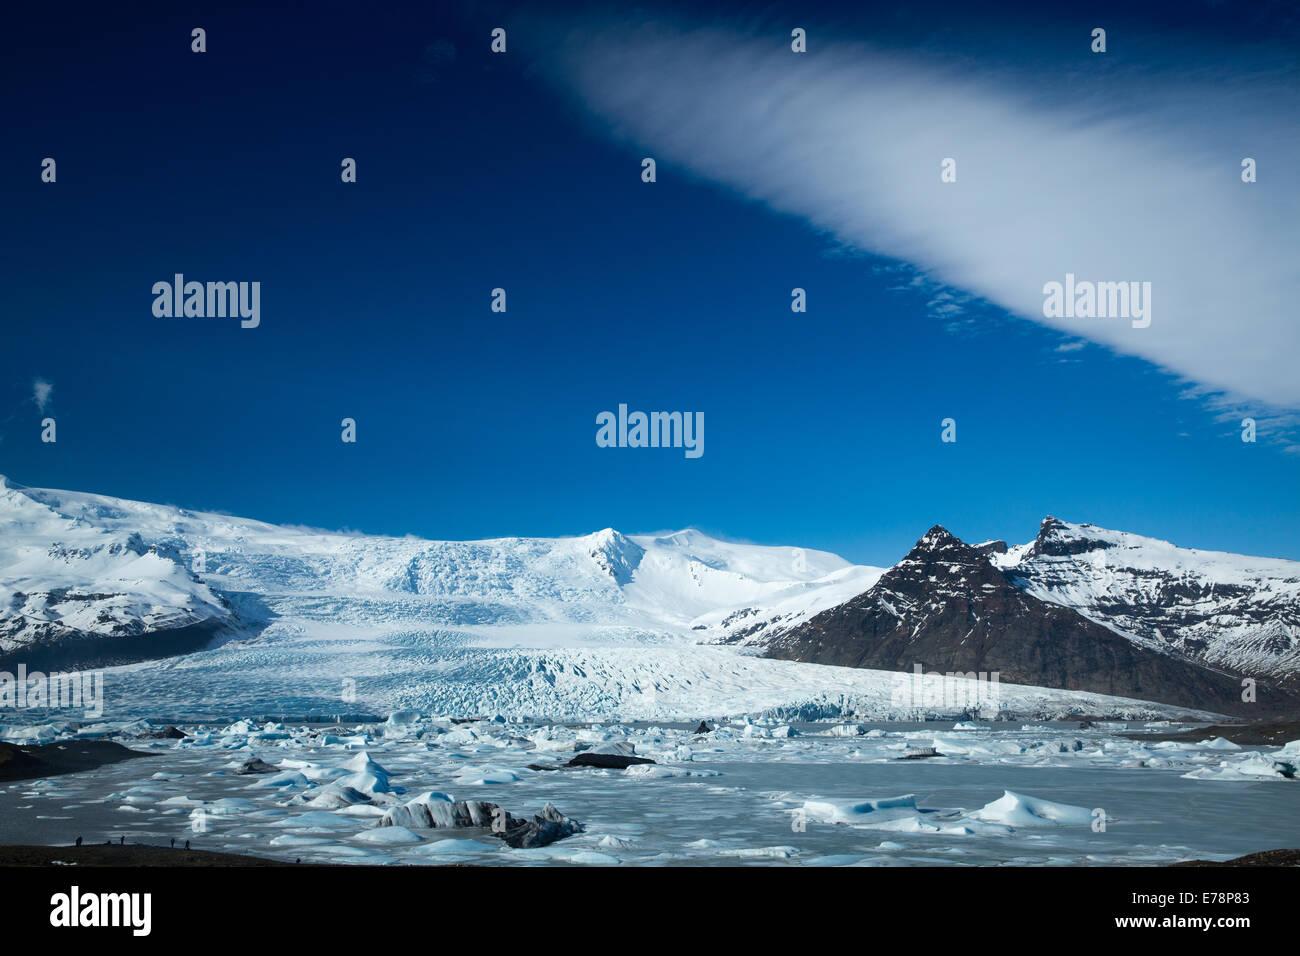 El glaciar Vatnajokull descendente al nivel del mar, al este de Islandia Fjallsarlon, Imagen De Stock